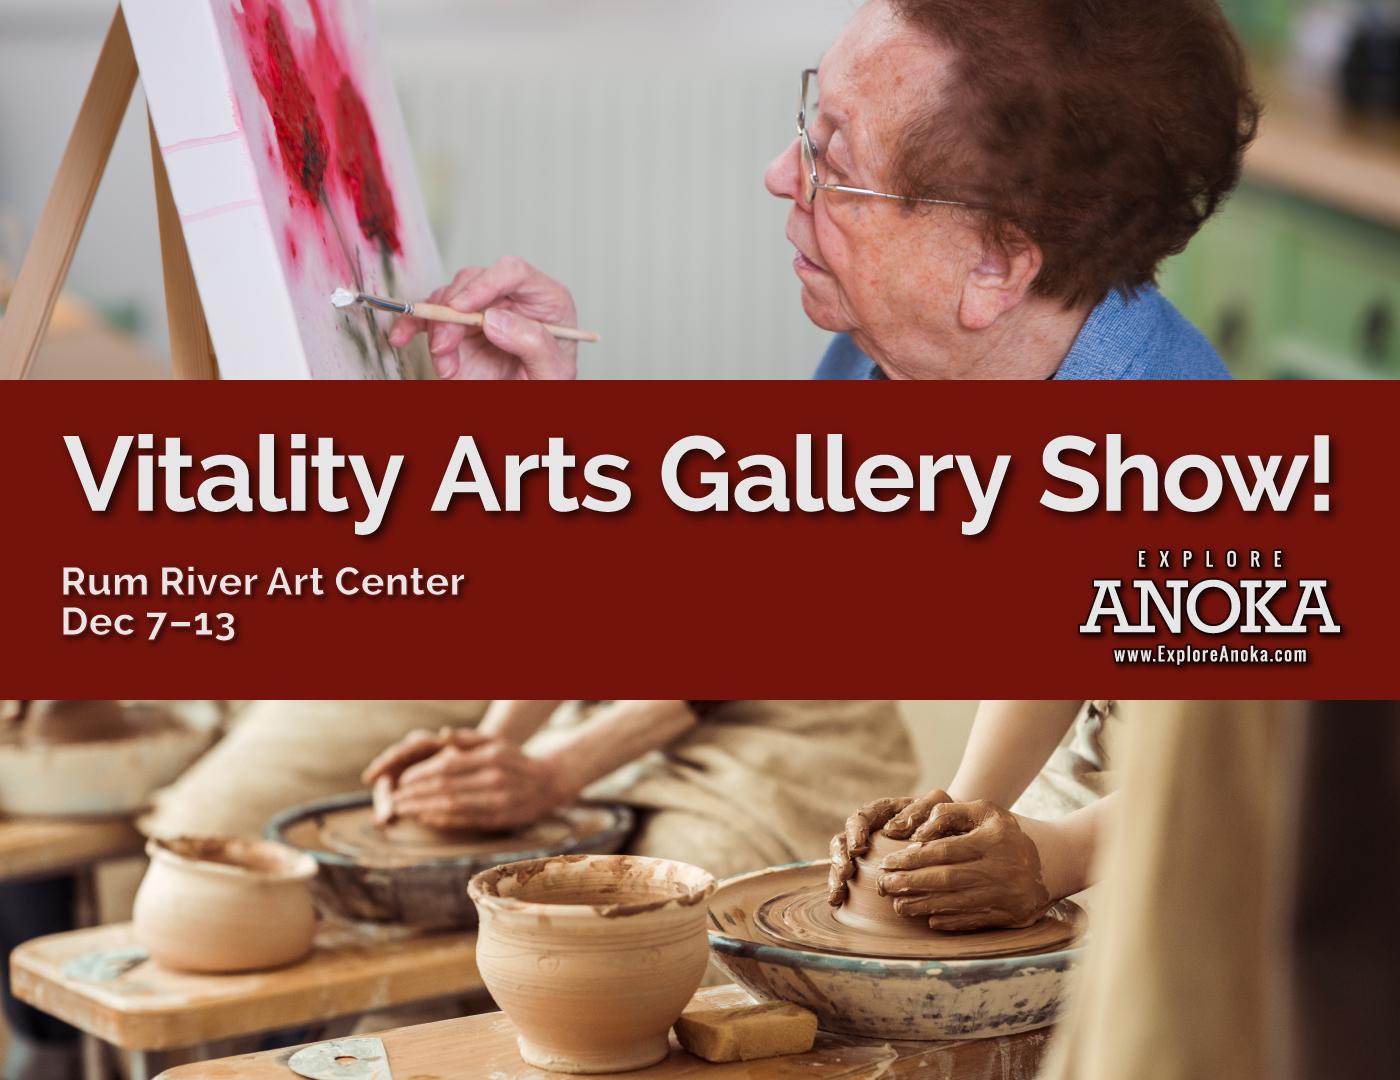 Vitality Arts Gallery Show - Rum River Art Center